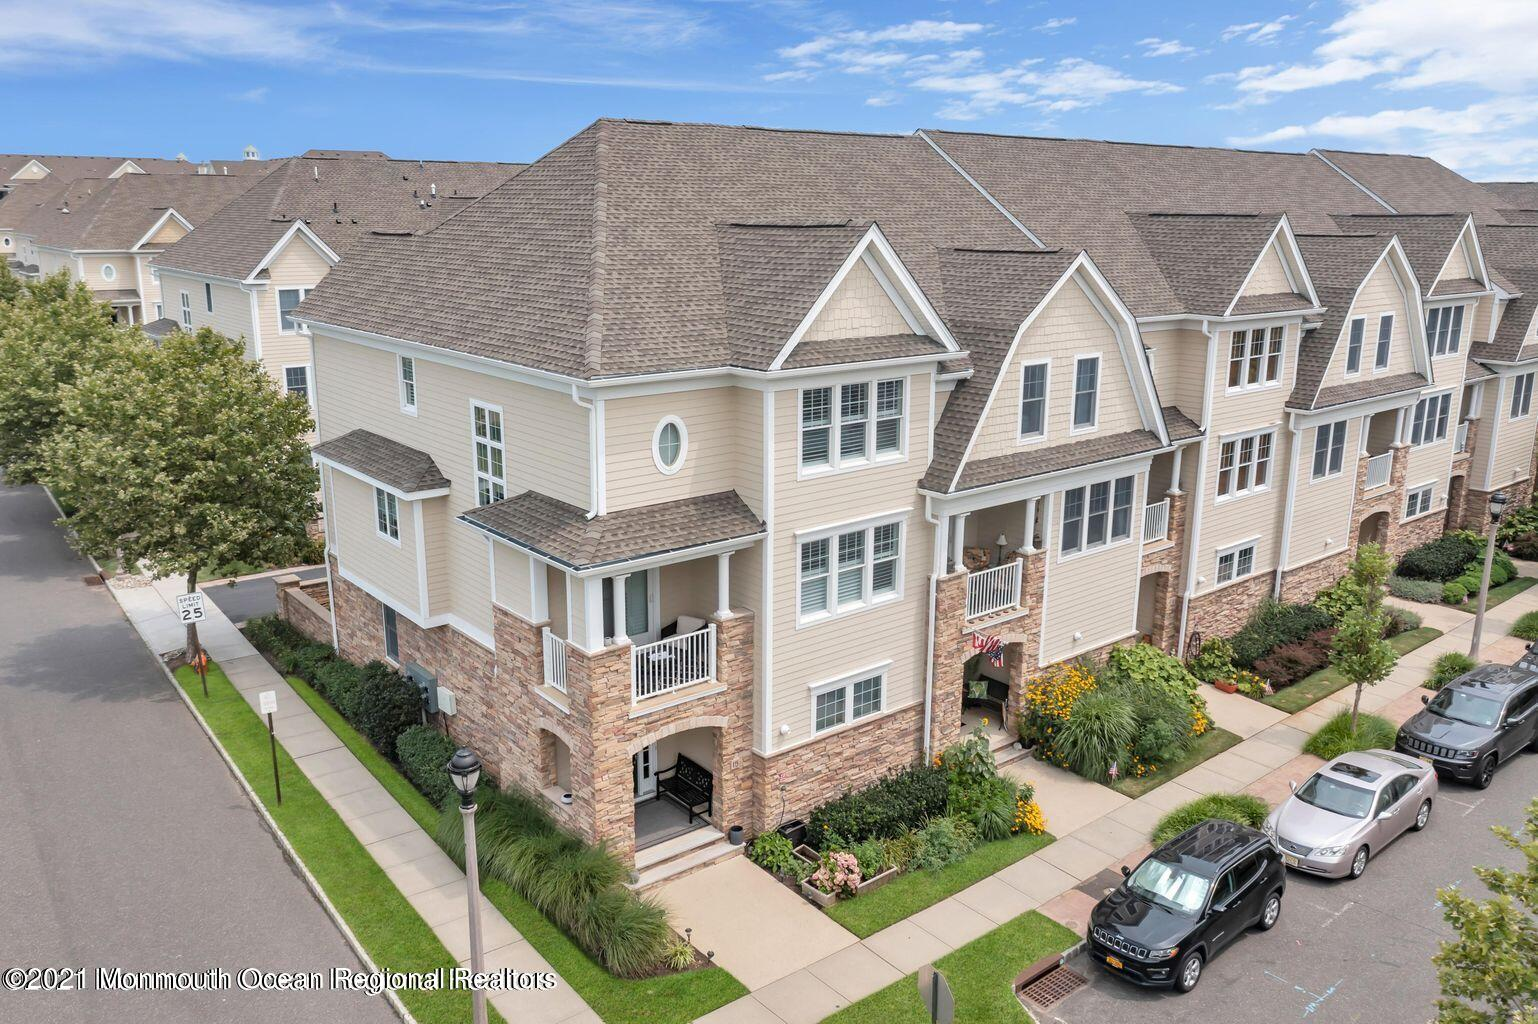 Photo of 15 Whitman Terrace, Long Branch, NJ 07740